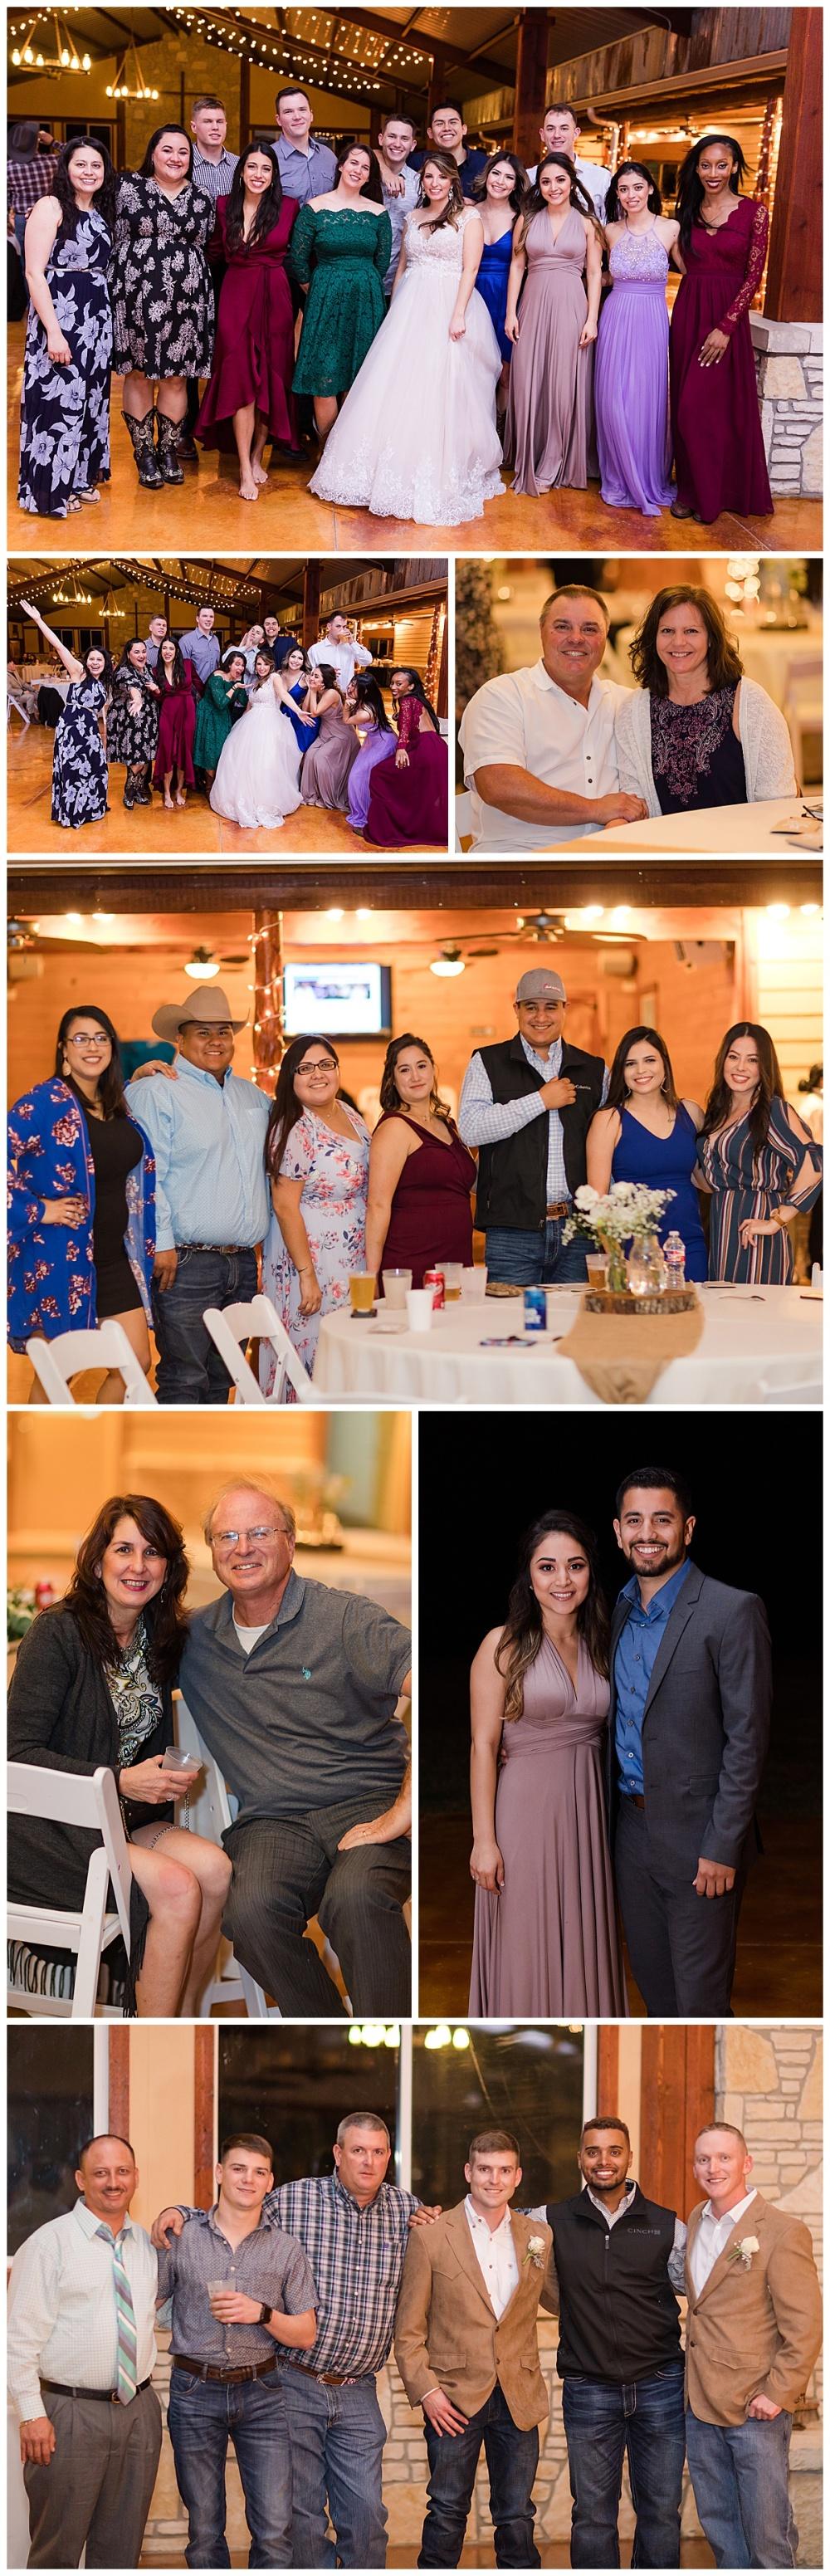 Wedding-Photographer-Texas-Hill-Country-Happy-H-Ranch-Comfor-Texas-Carly-Barton-Photography_0078.jpg